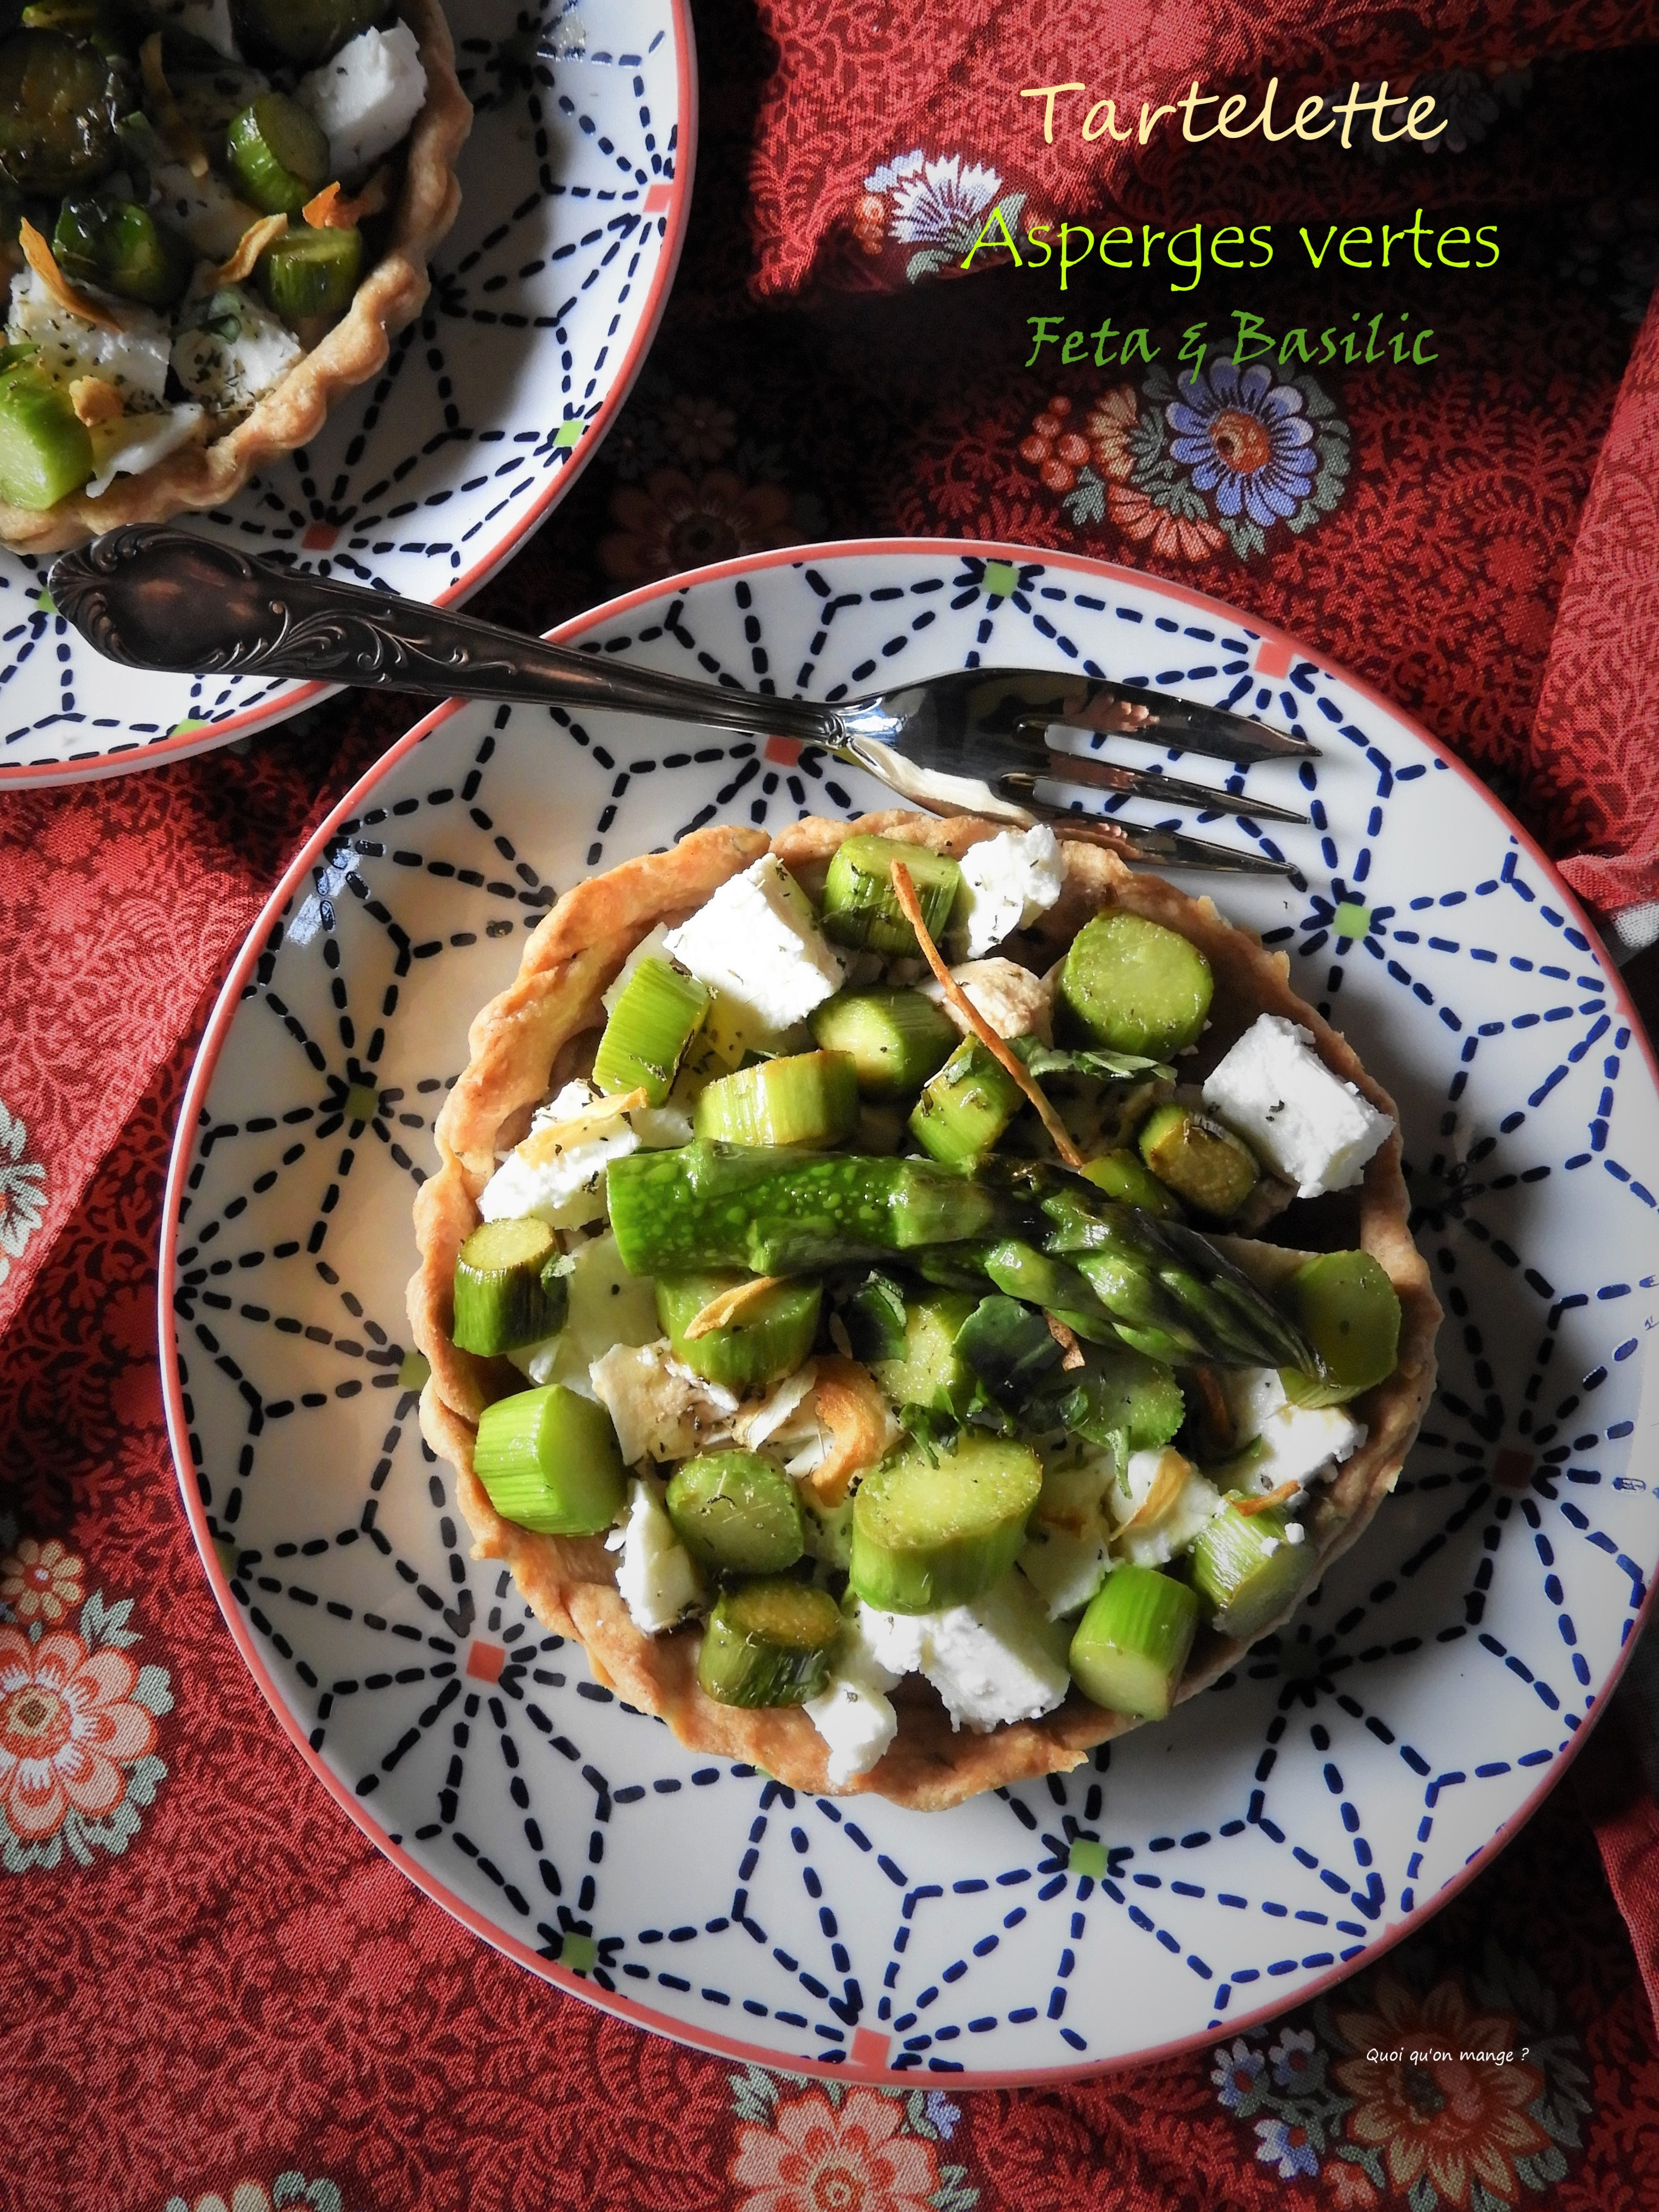 Tartelette asperges vertes, feta & basilic